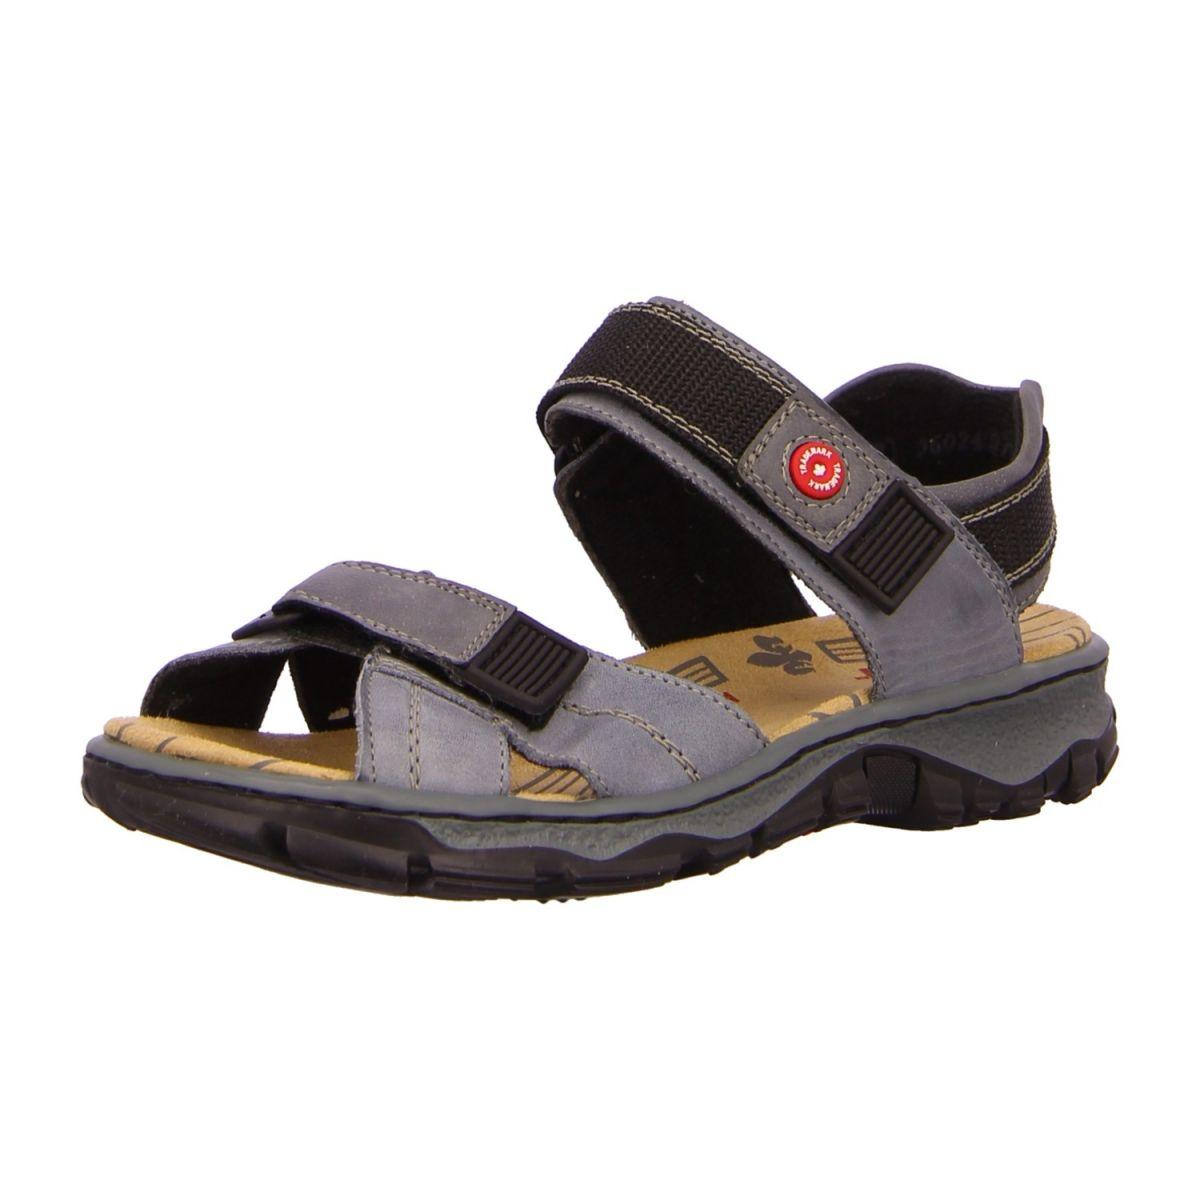 Rieker Herren Sandale in blau | SALE Schuhfachmann